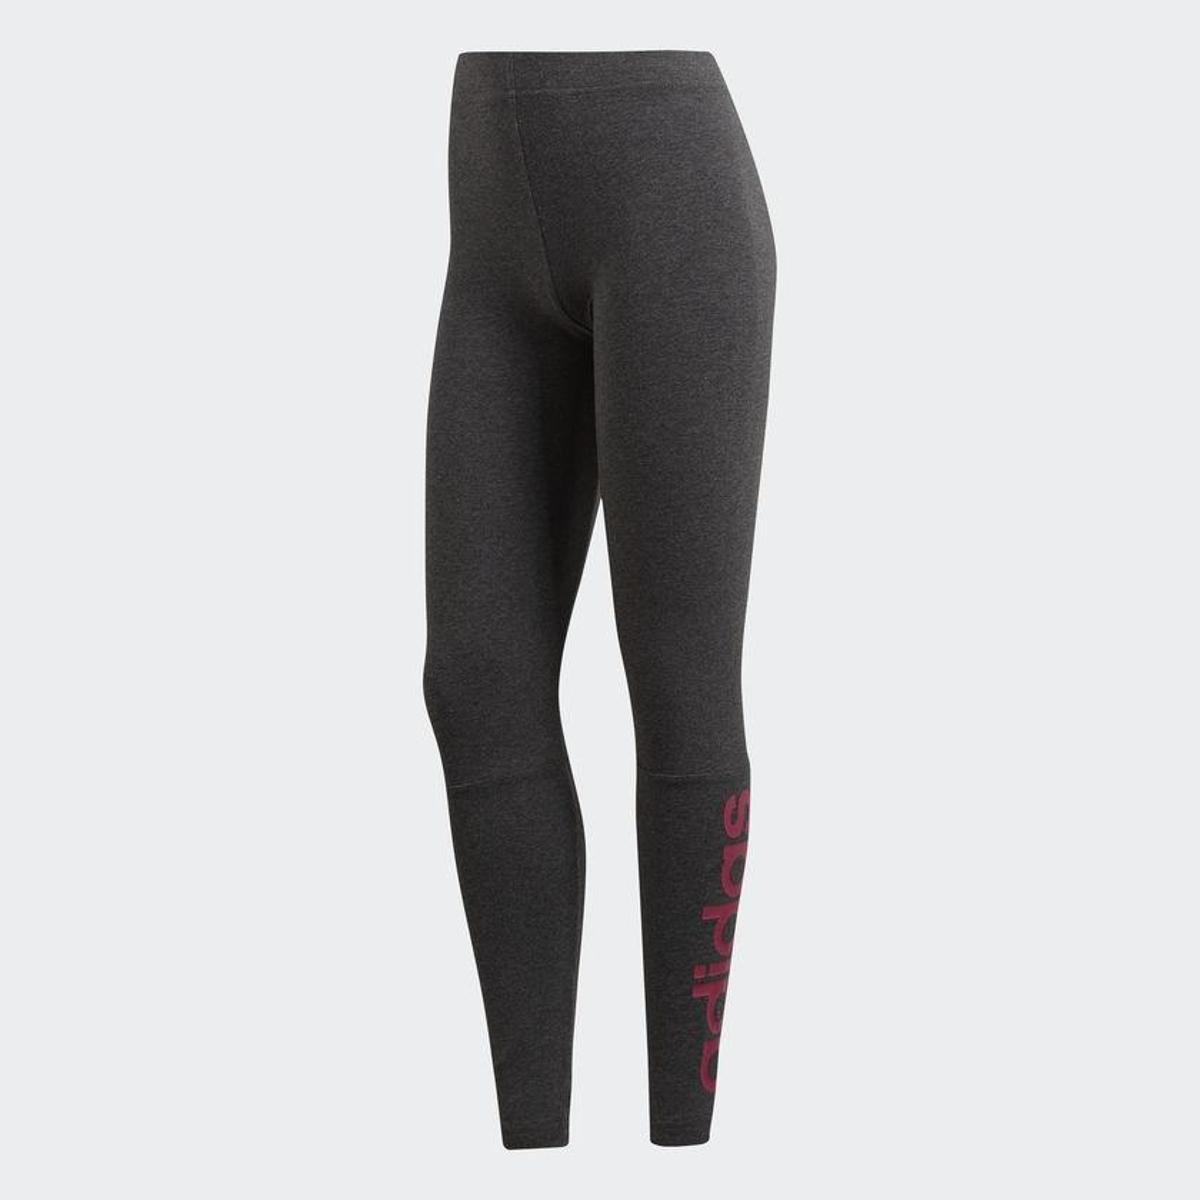 Essential Calça Feminina Adidas Legging Calça Linear Legging Cinza wIYxdI